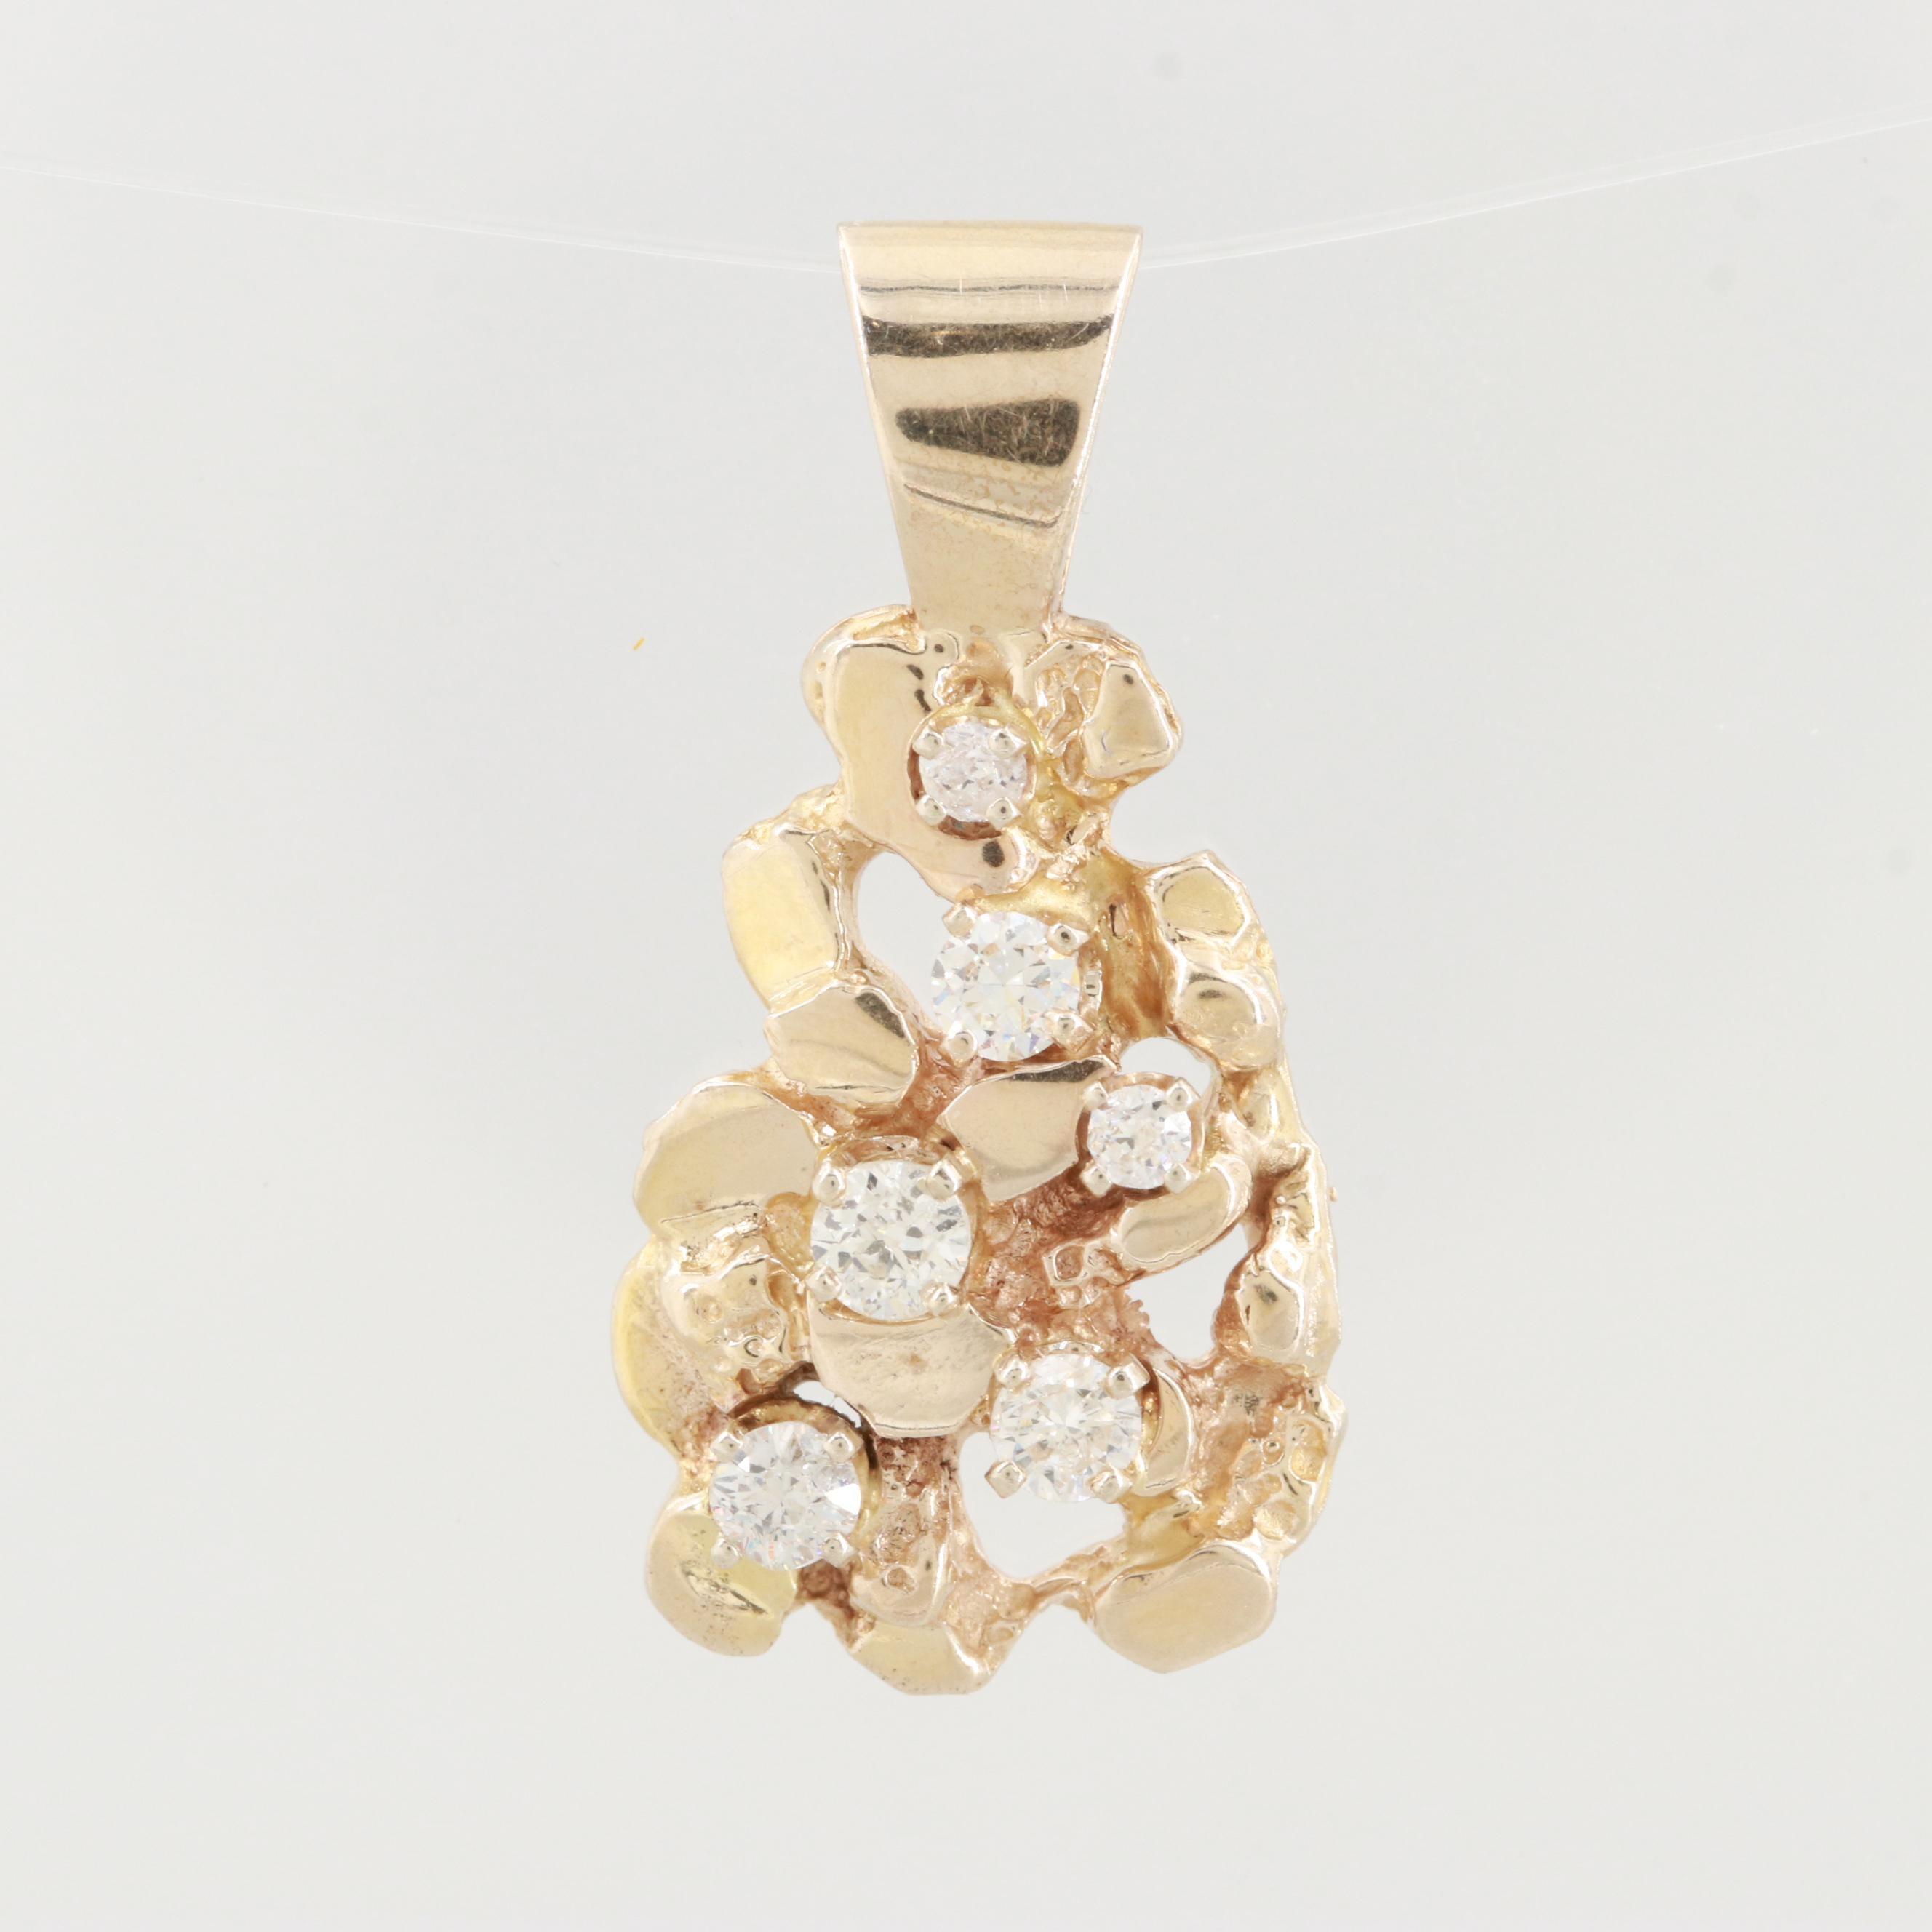 14K Yellow Gold Diamond Nugget Style Pendant